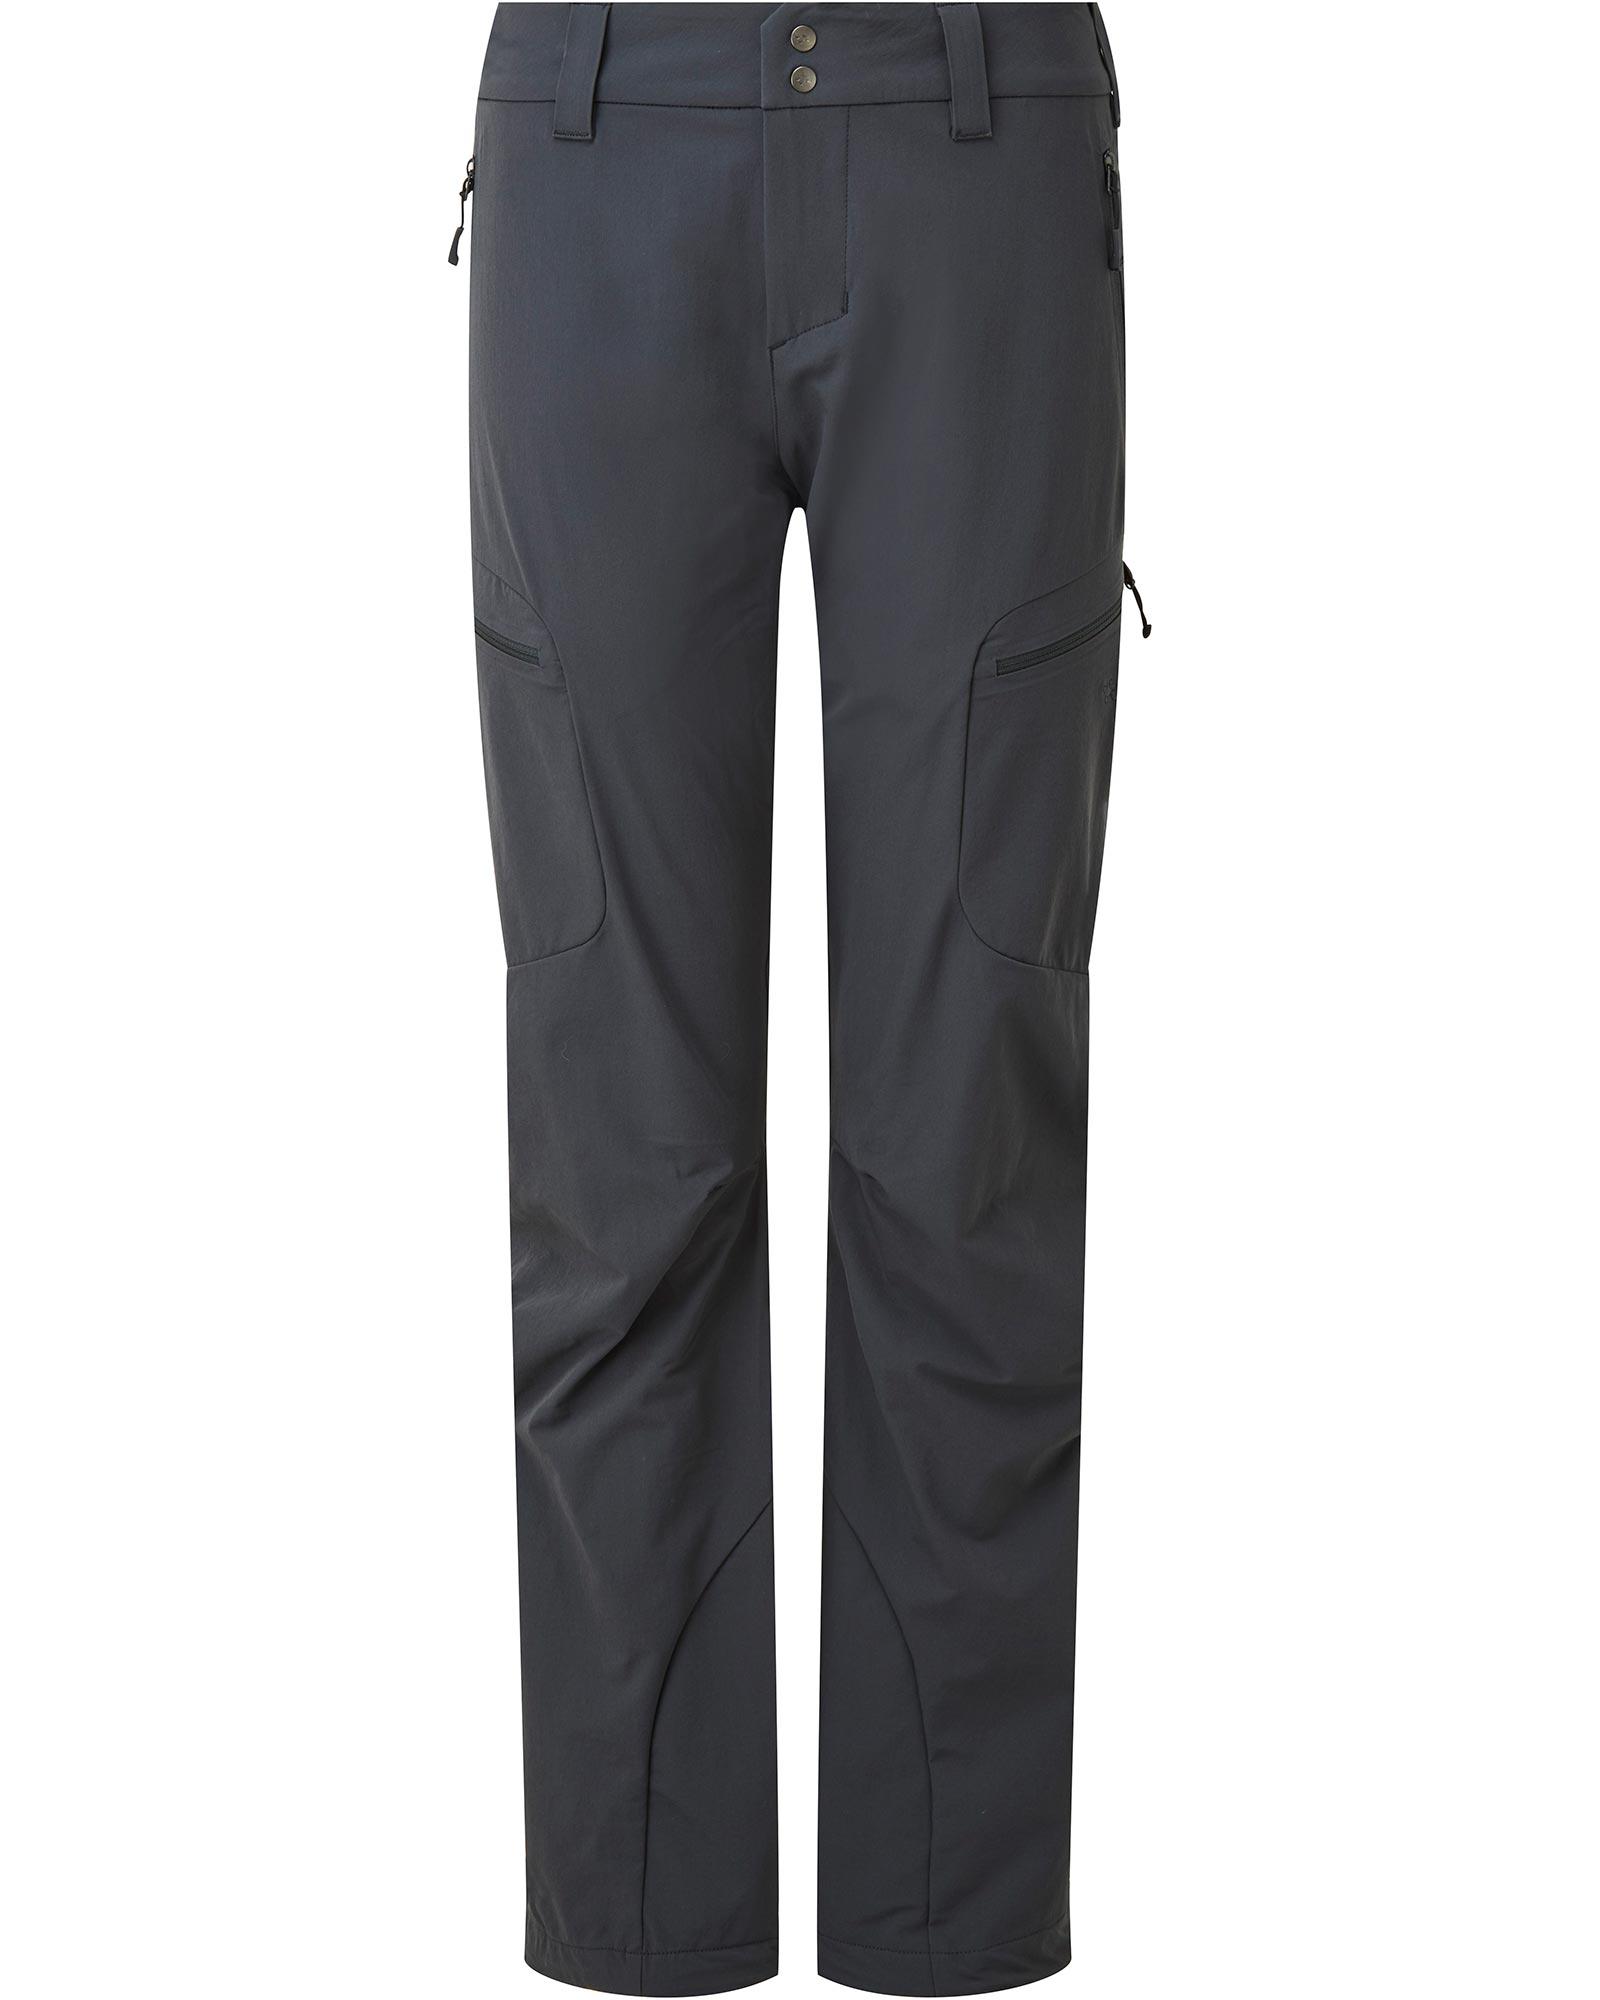 Rab Women's Sawtooth Pants Reg 0